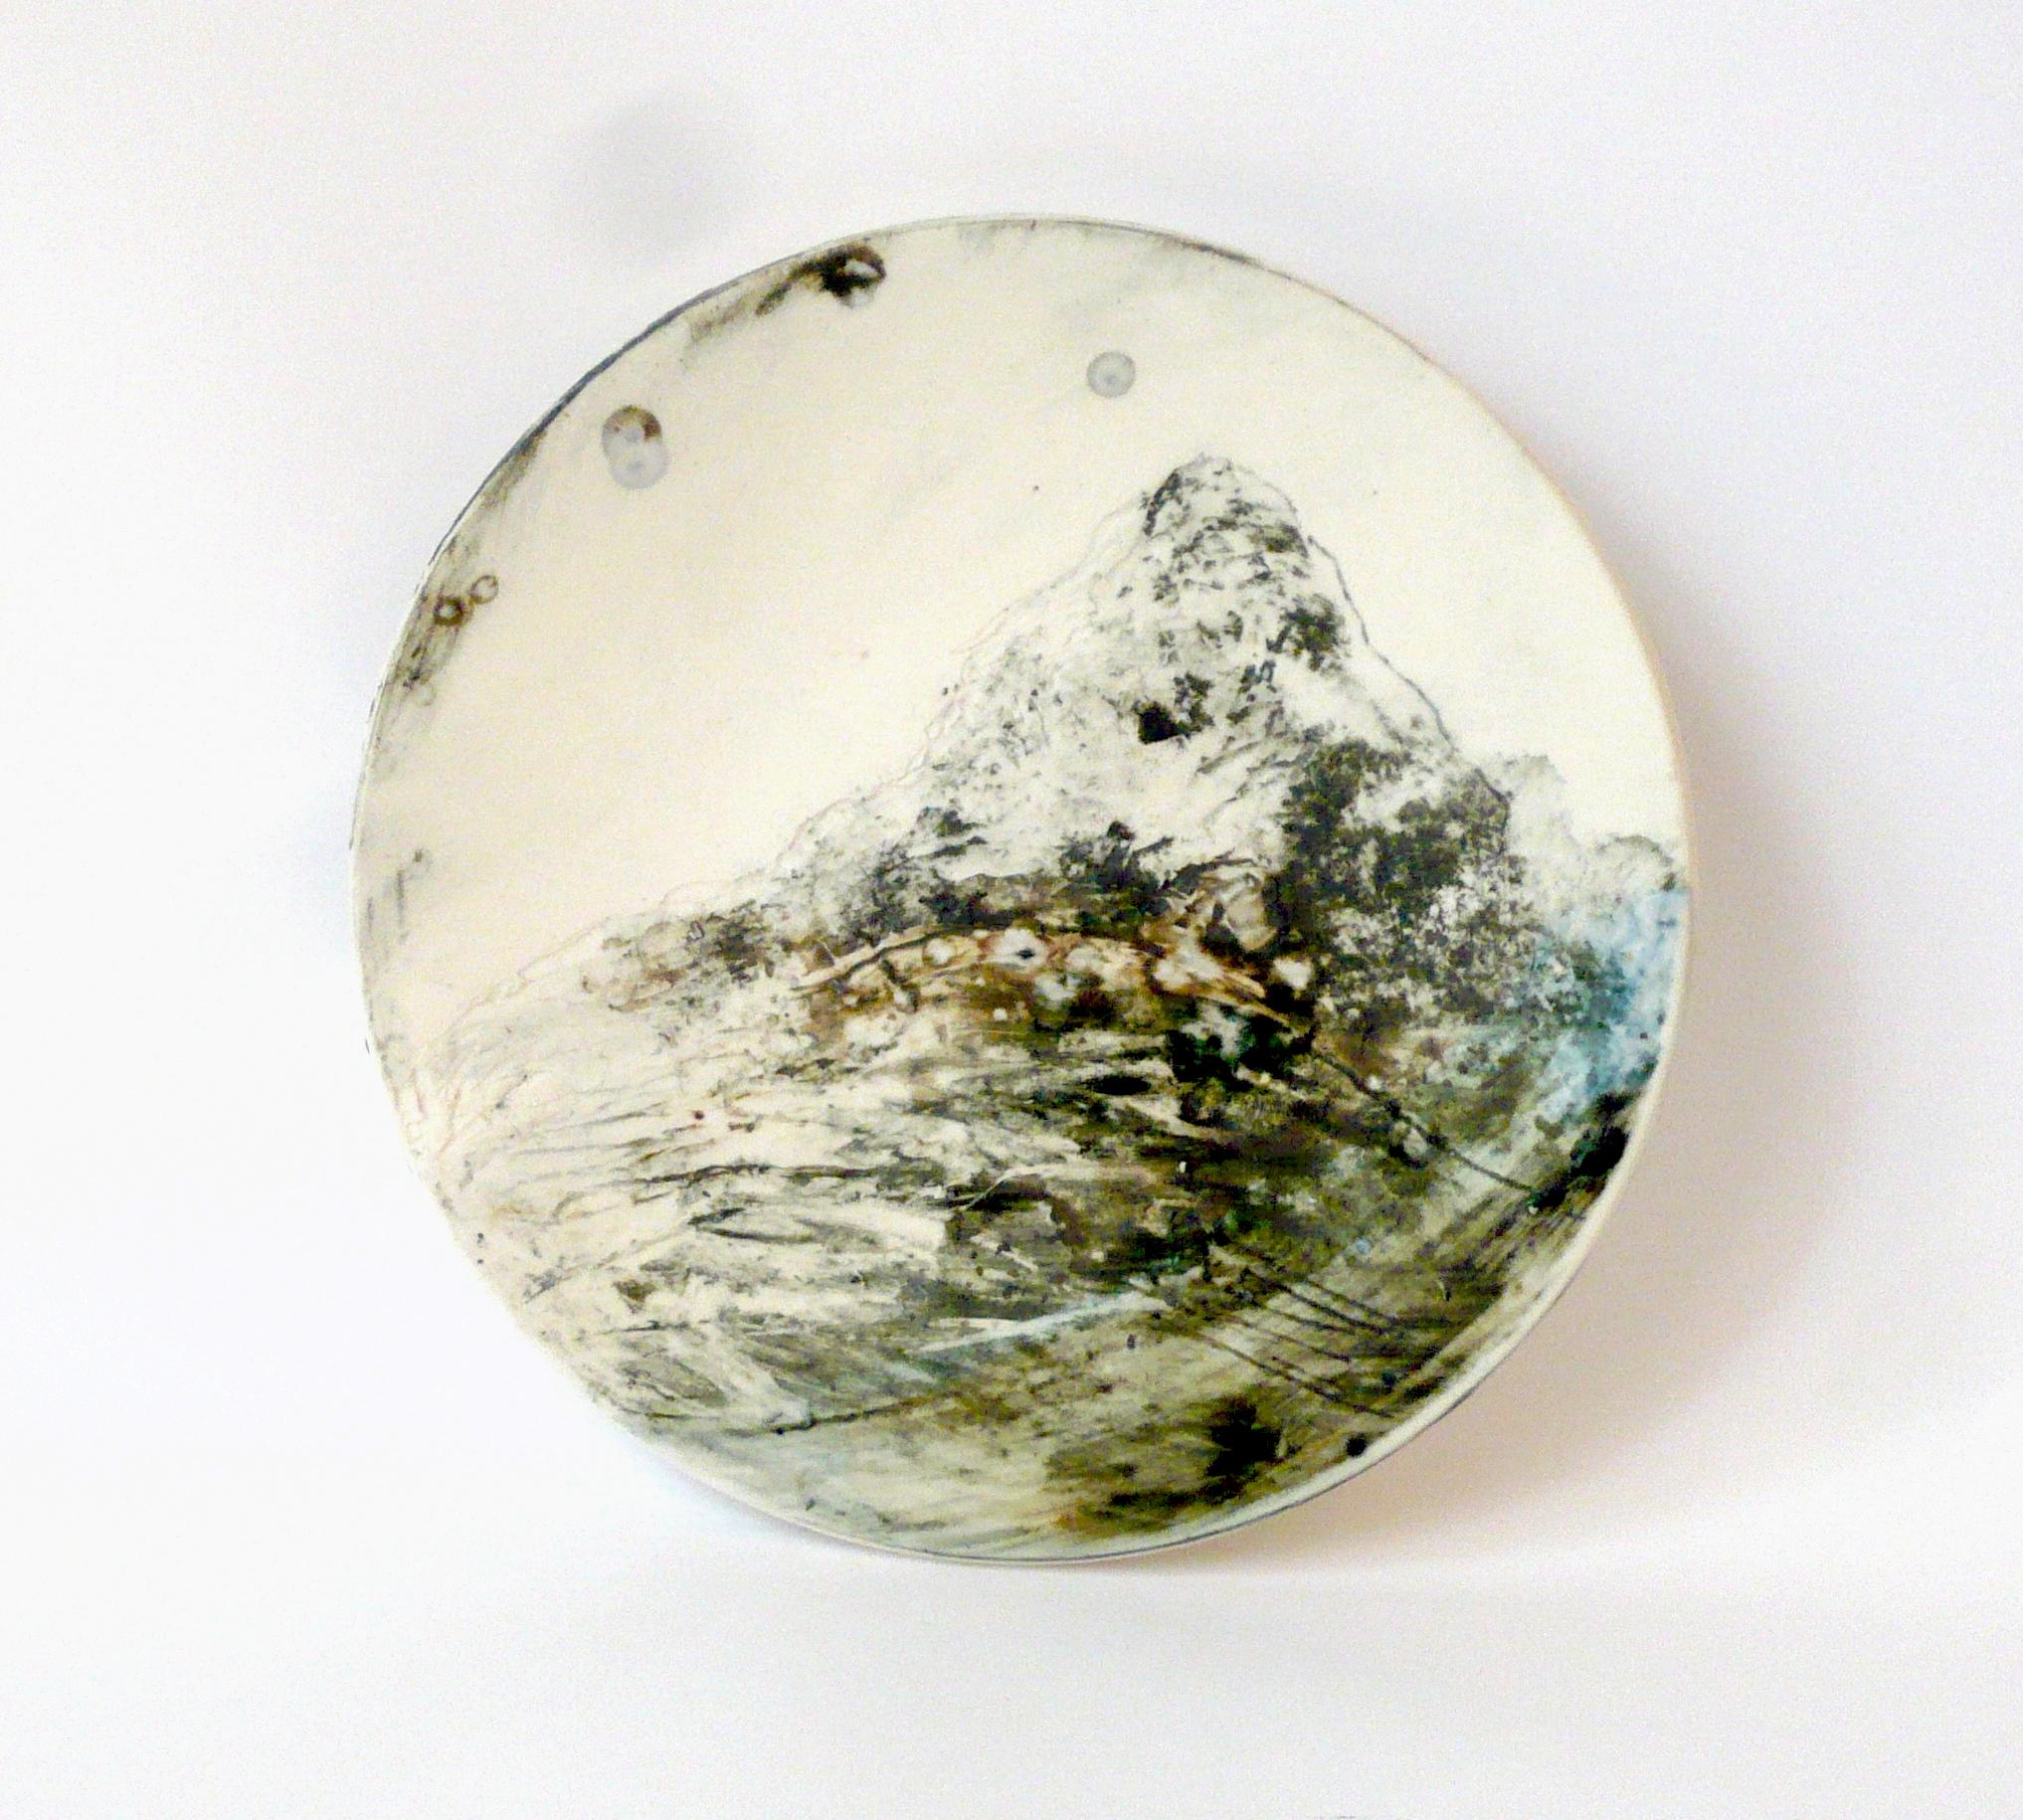 Jokainen taipuu / Everyone bends, 2017, 17cm x 17cm x 2cm